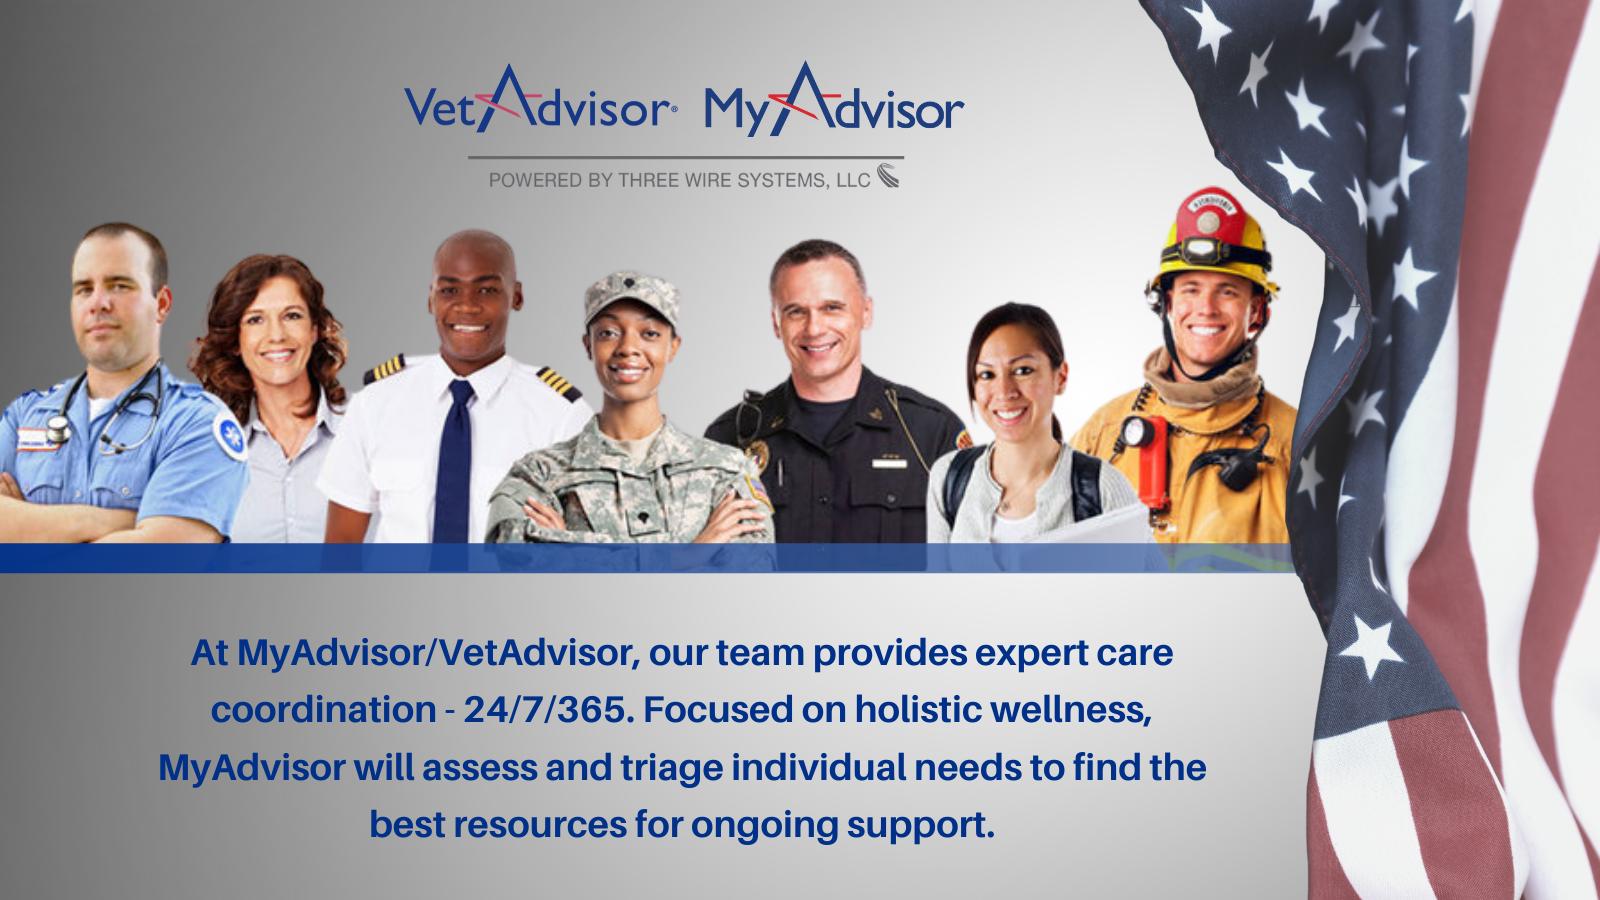 New Office, Same Mission: MyAdvisor Serves Those Who Serve Others